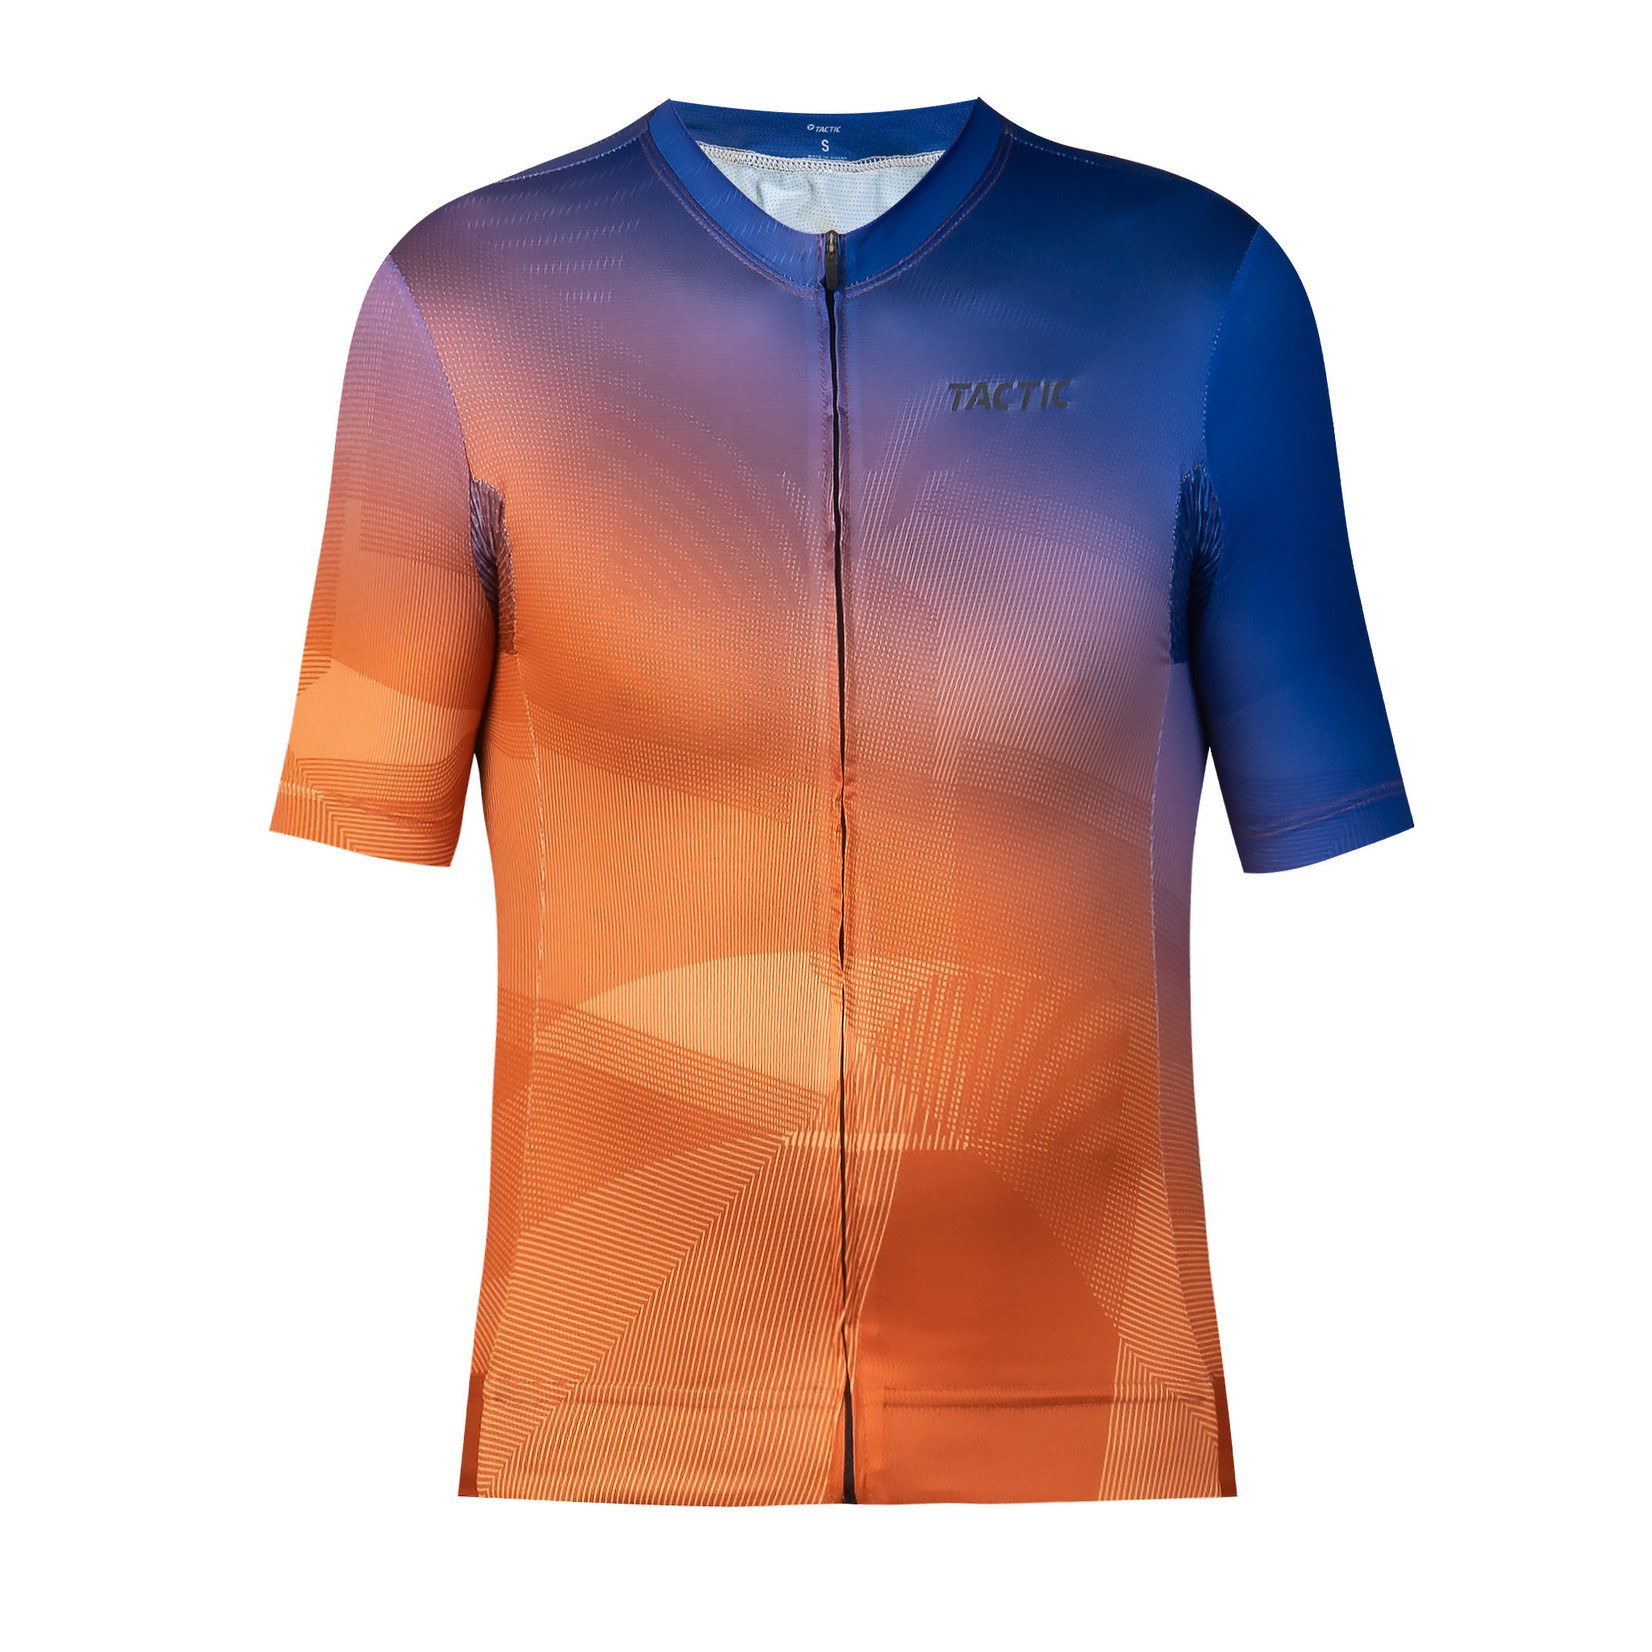 Tactic TACTIC Short Sleeve Jersey - Atacama